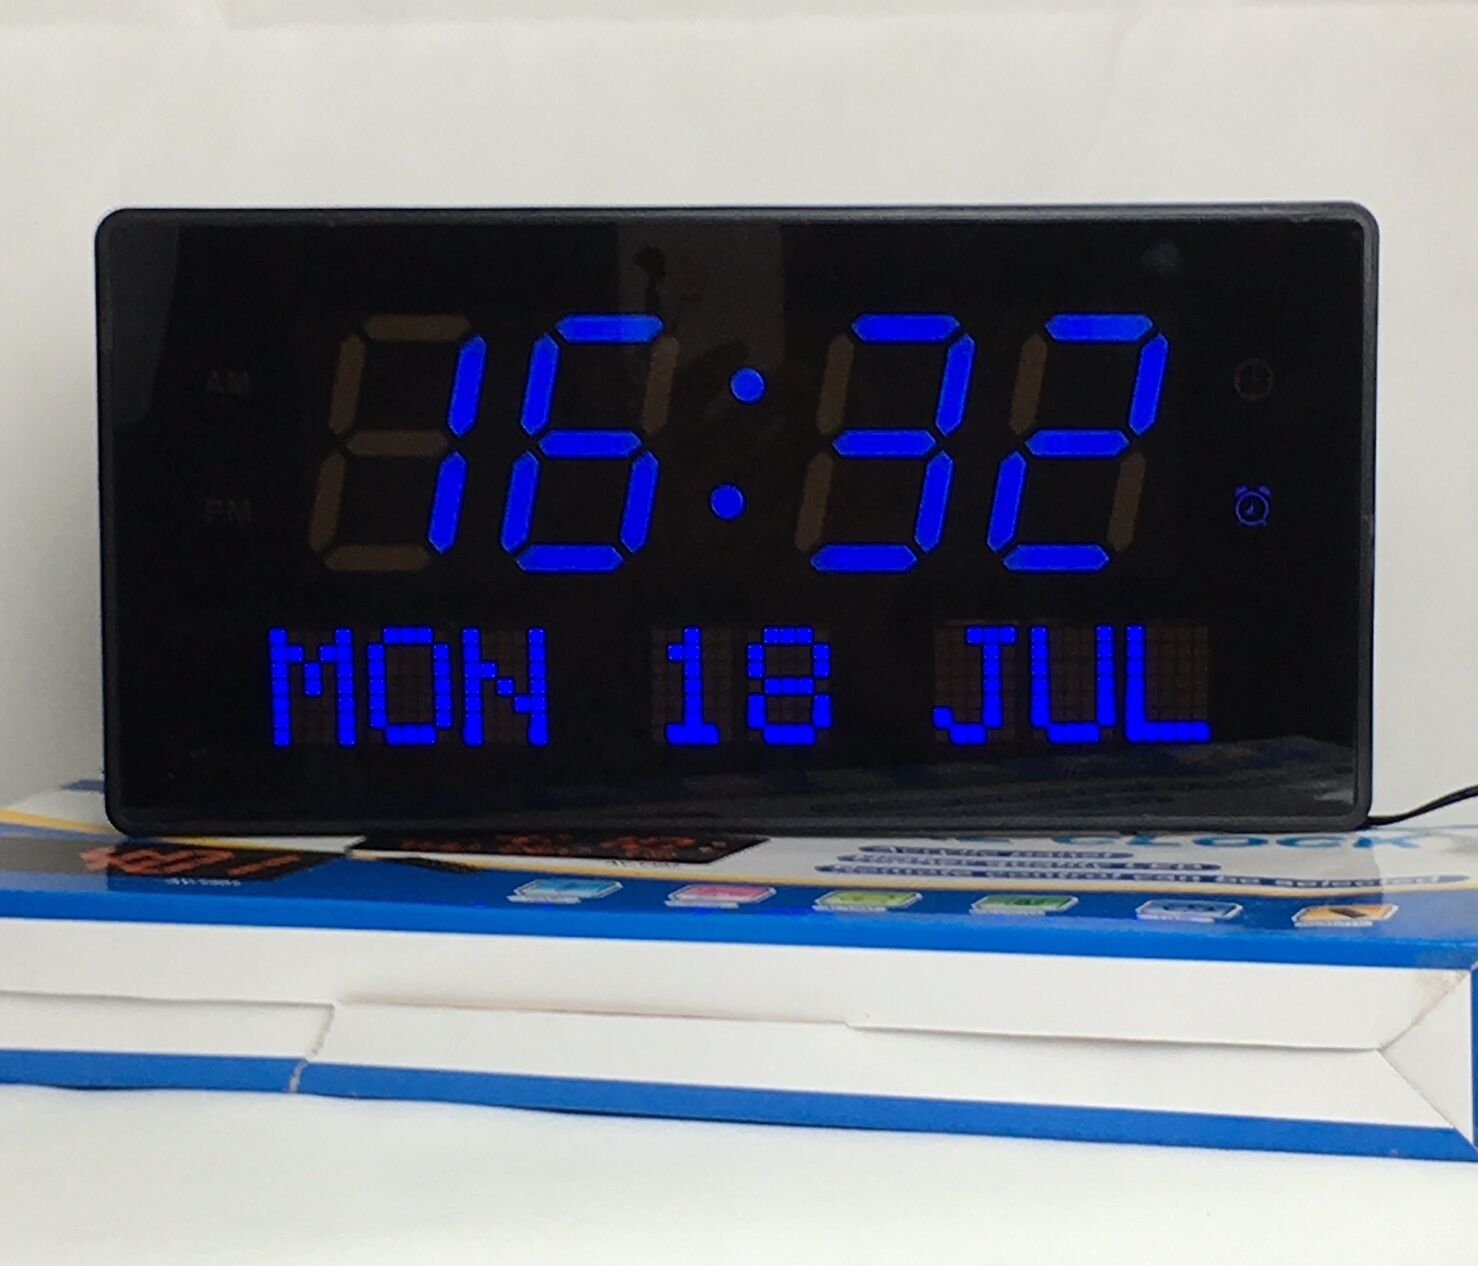 multi led digital wanduhr mit datumanzeige alarm gross hell in blau ay1402 ebay. Black Bedroom Furniture Sets. Home Design Ideas